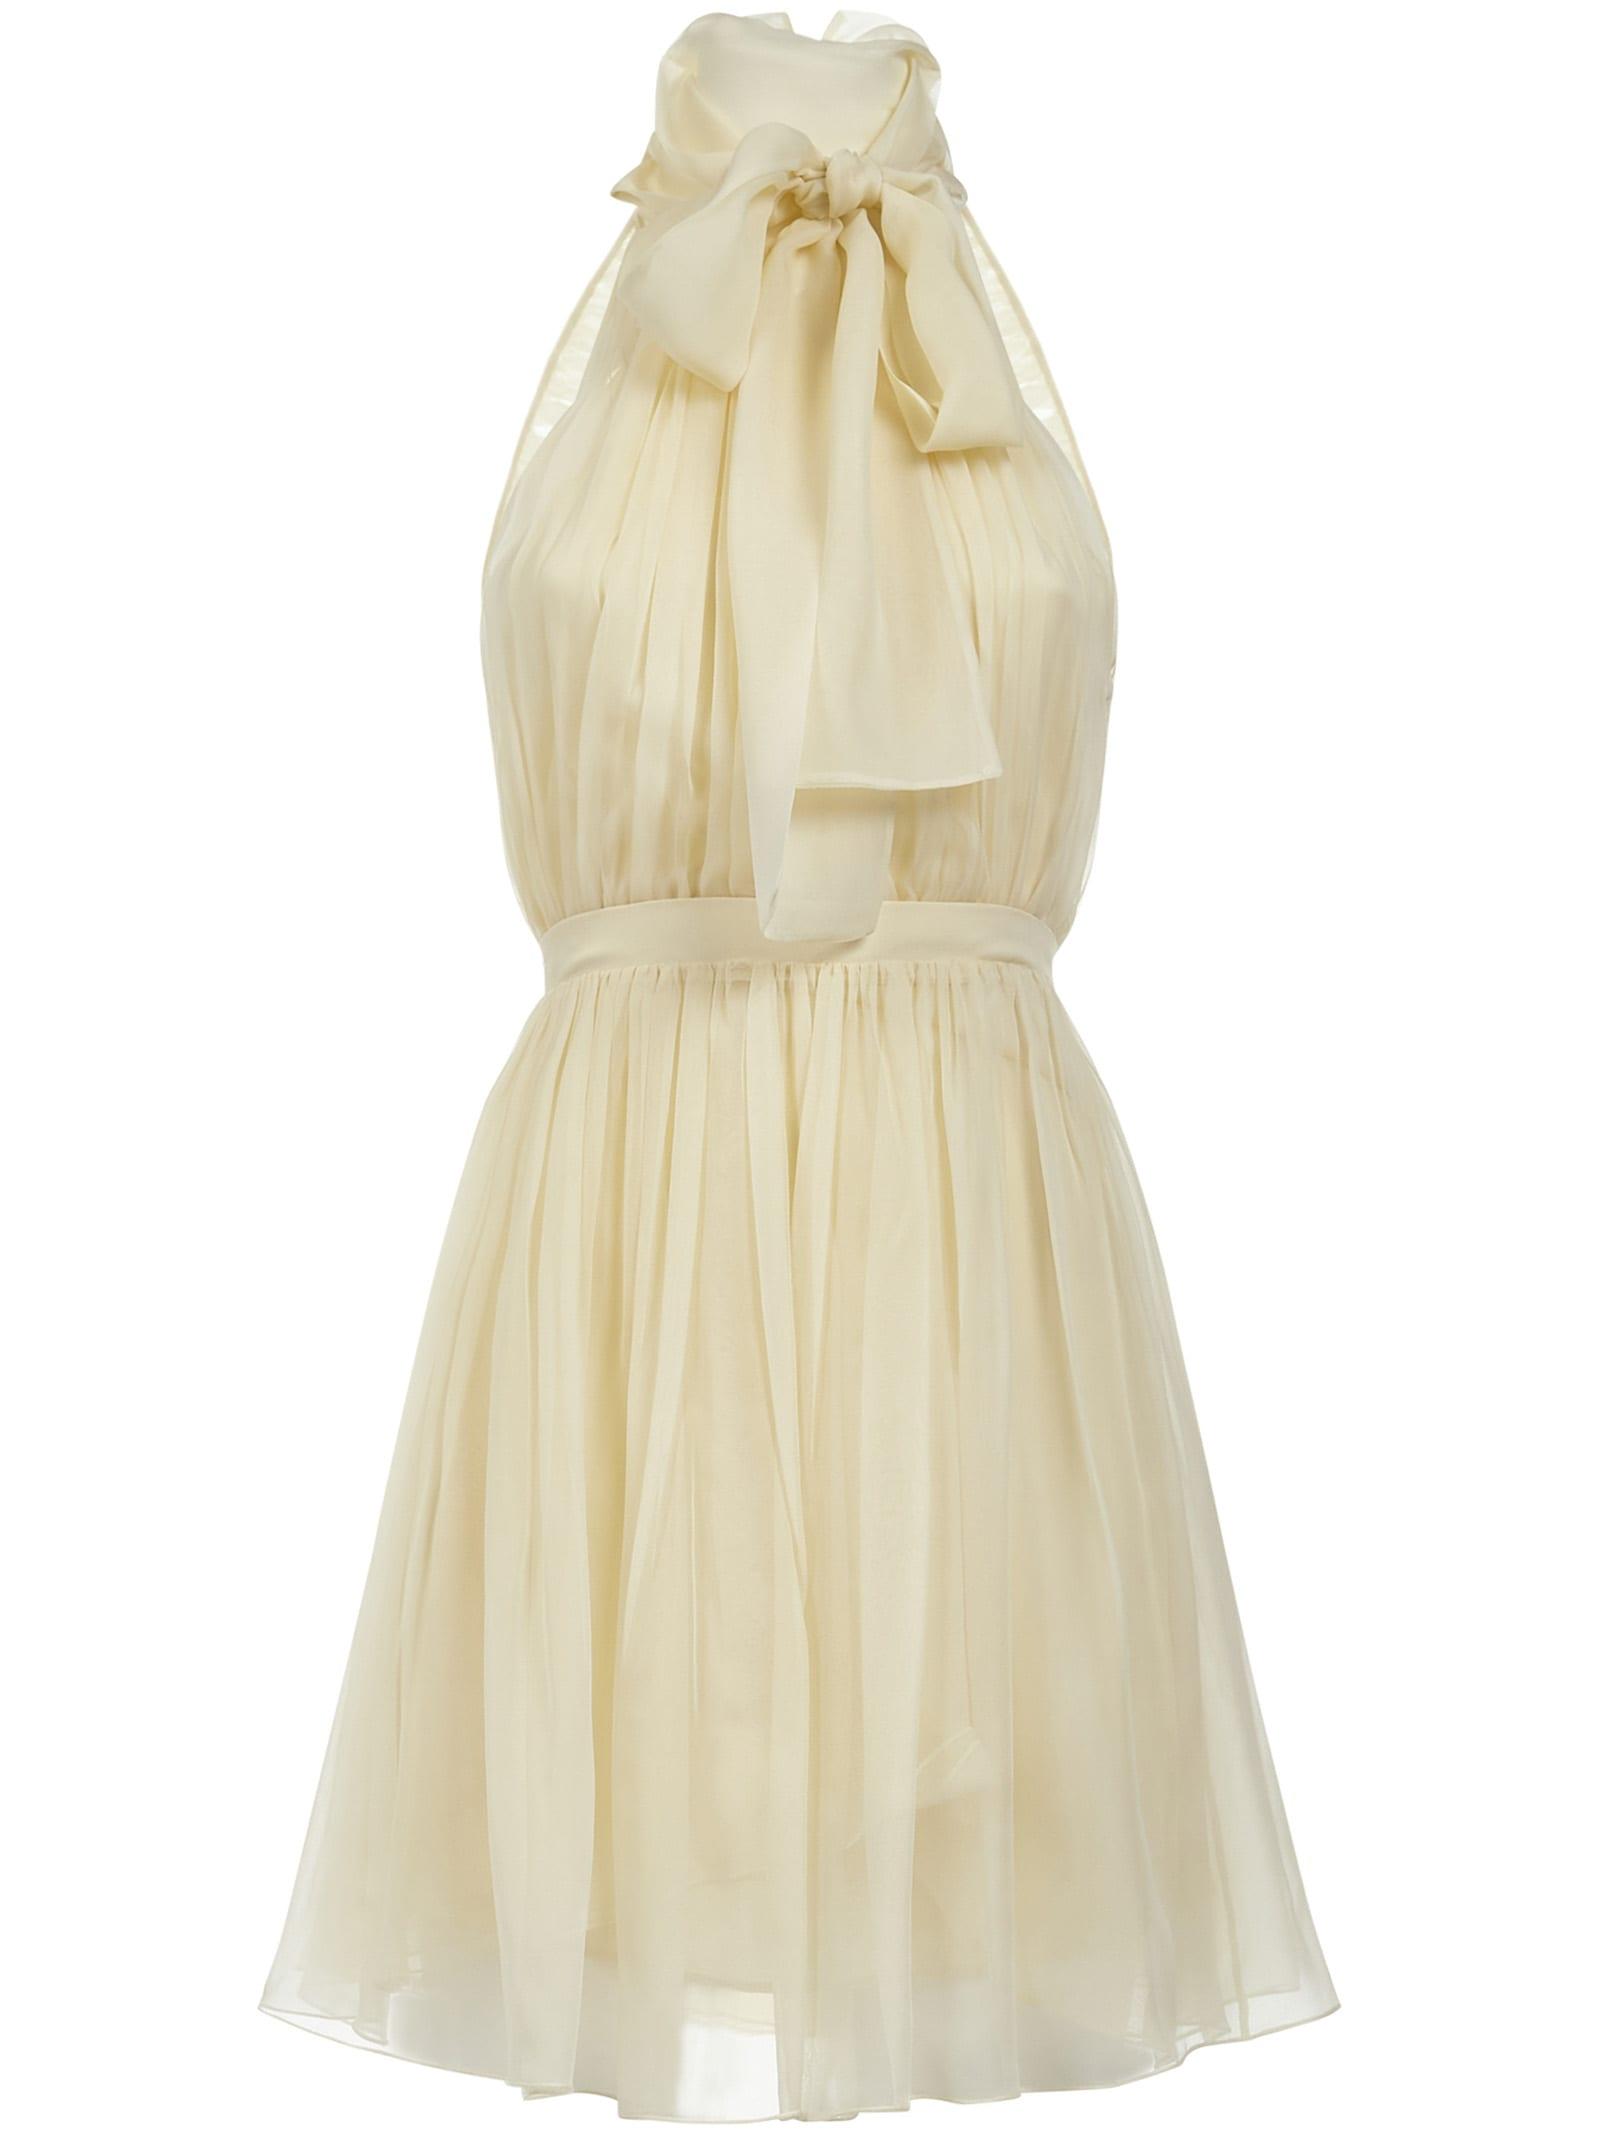 N°21 Dress